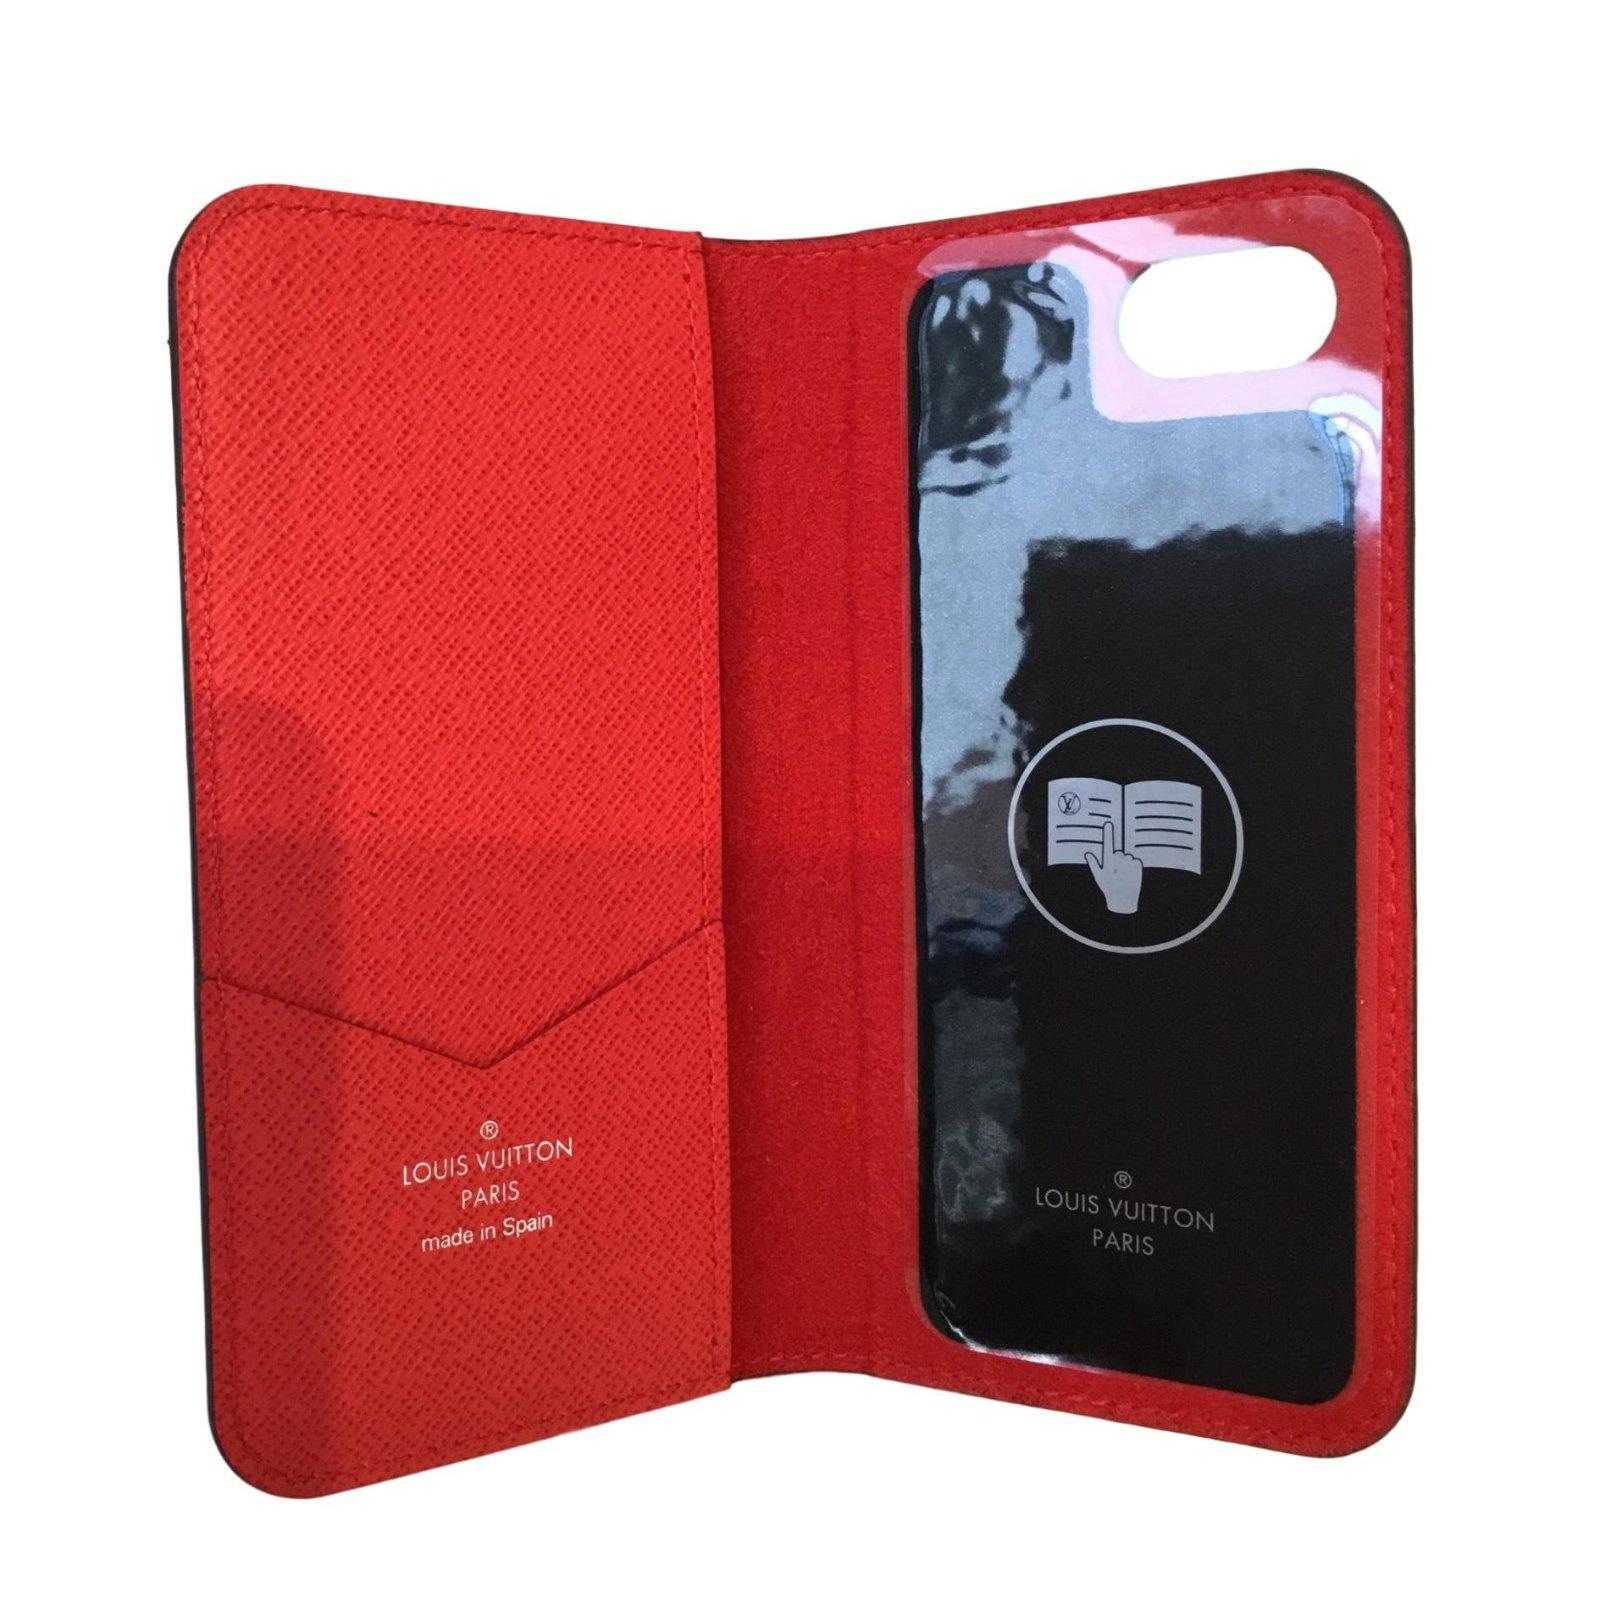 Louis Vuitton X Supreme Wallets Small Accessories Leather Red Ref 47438 Joli Closet